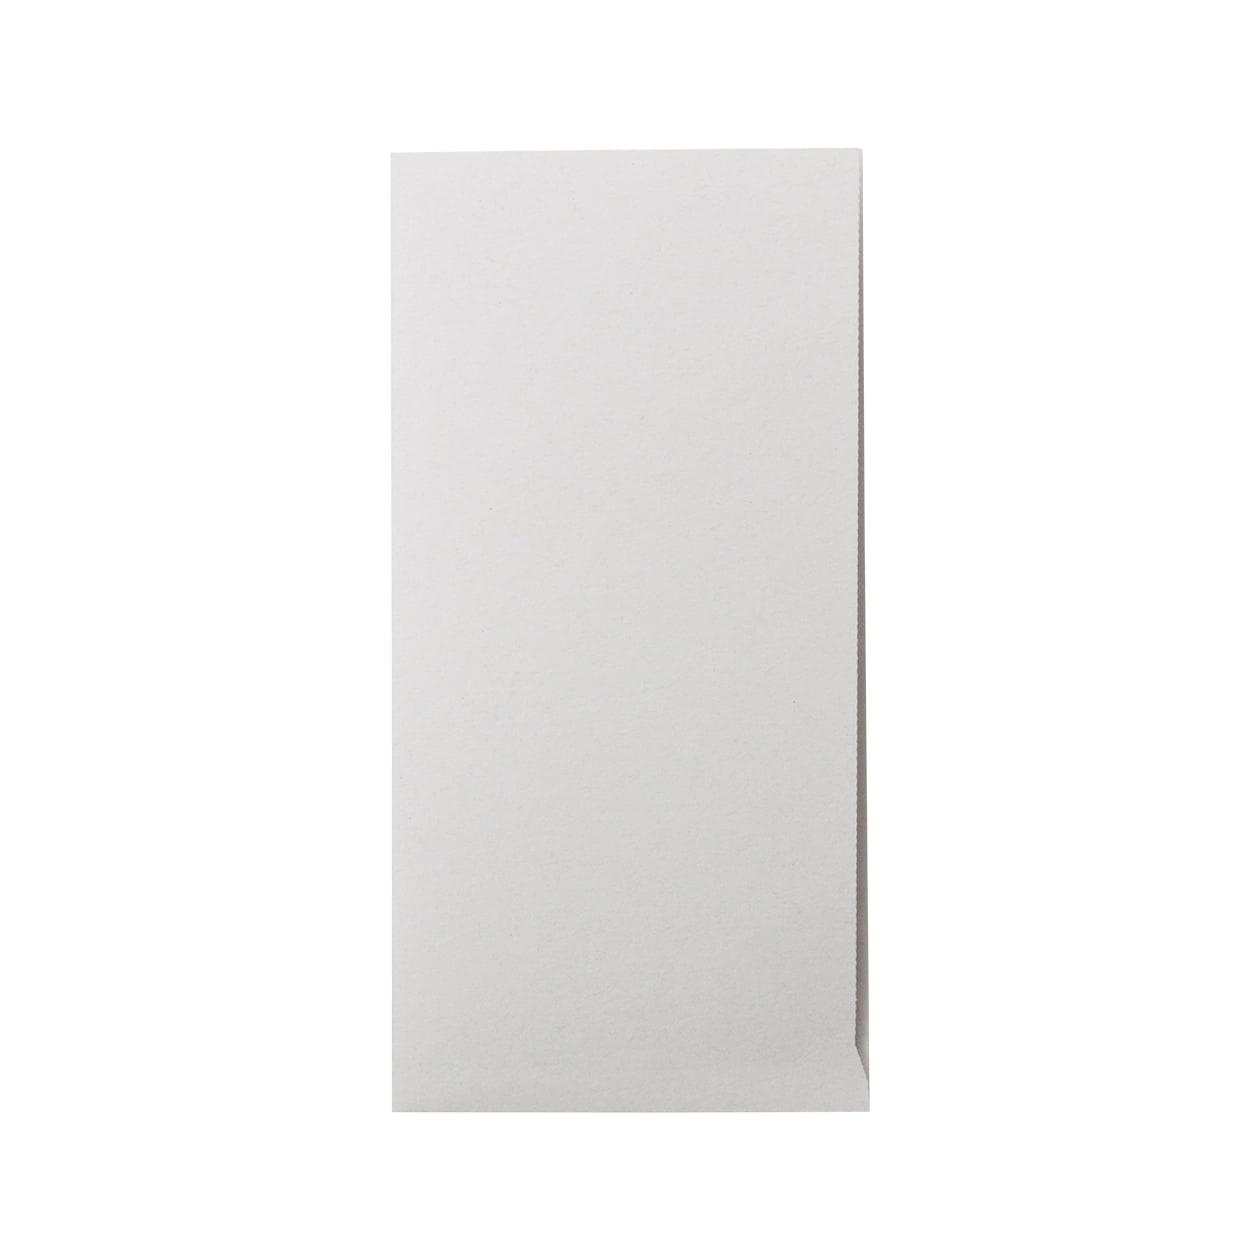 DLファイル HAGURUMA Basic ライナーグレイ 100g